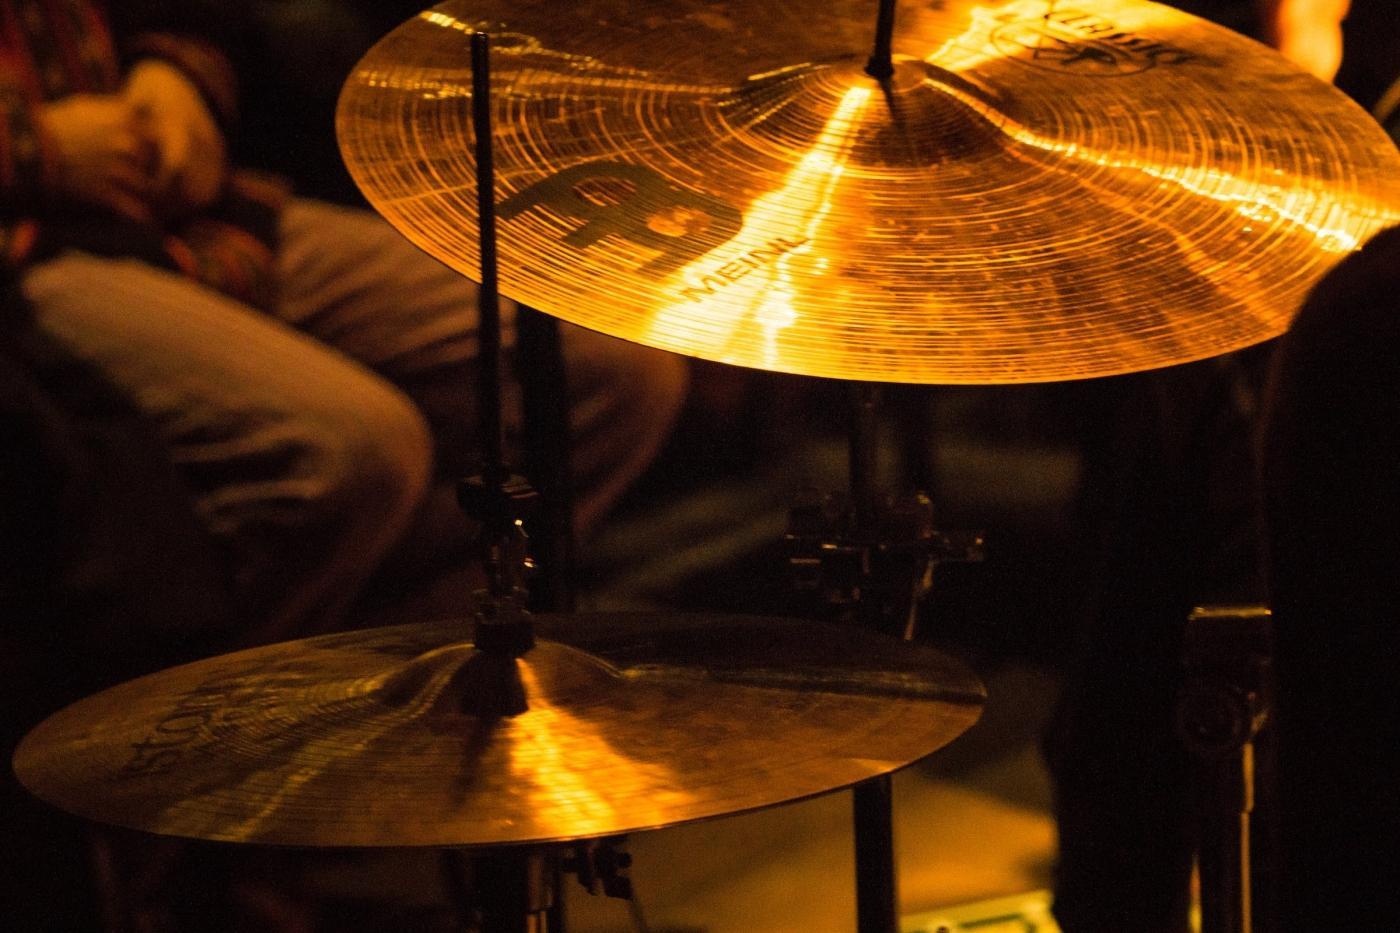 Concert at Takuss Bar. Photo by Stine Selmer Andersen - Visit Greenland